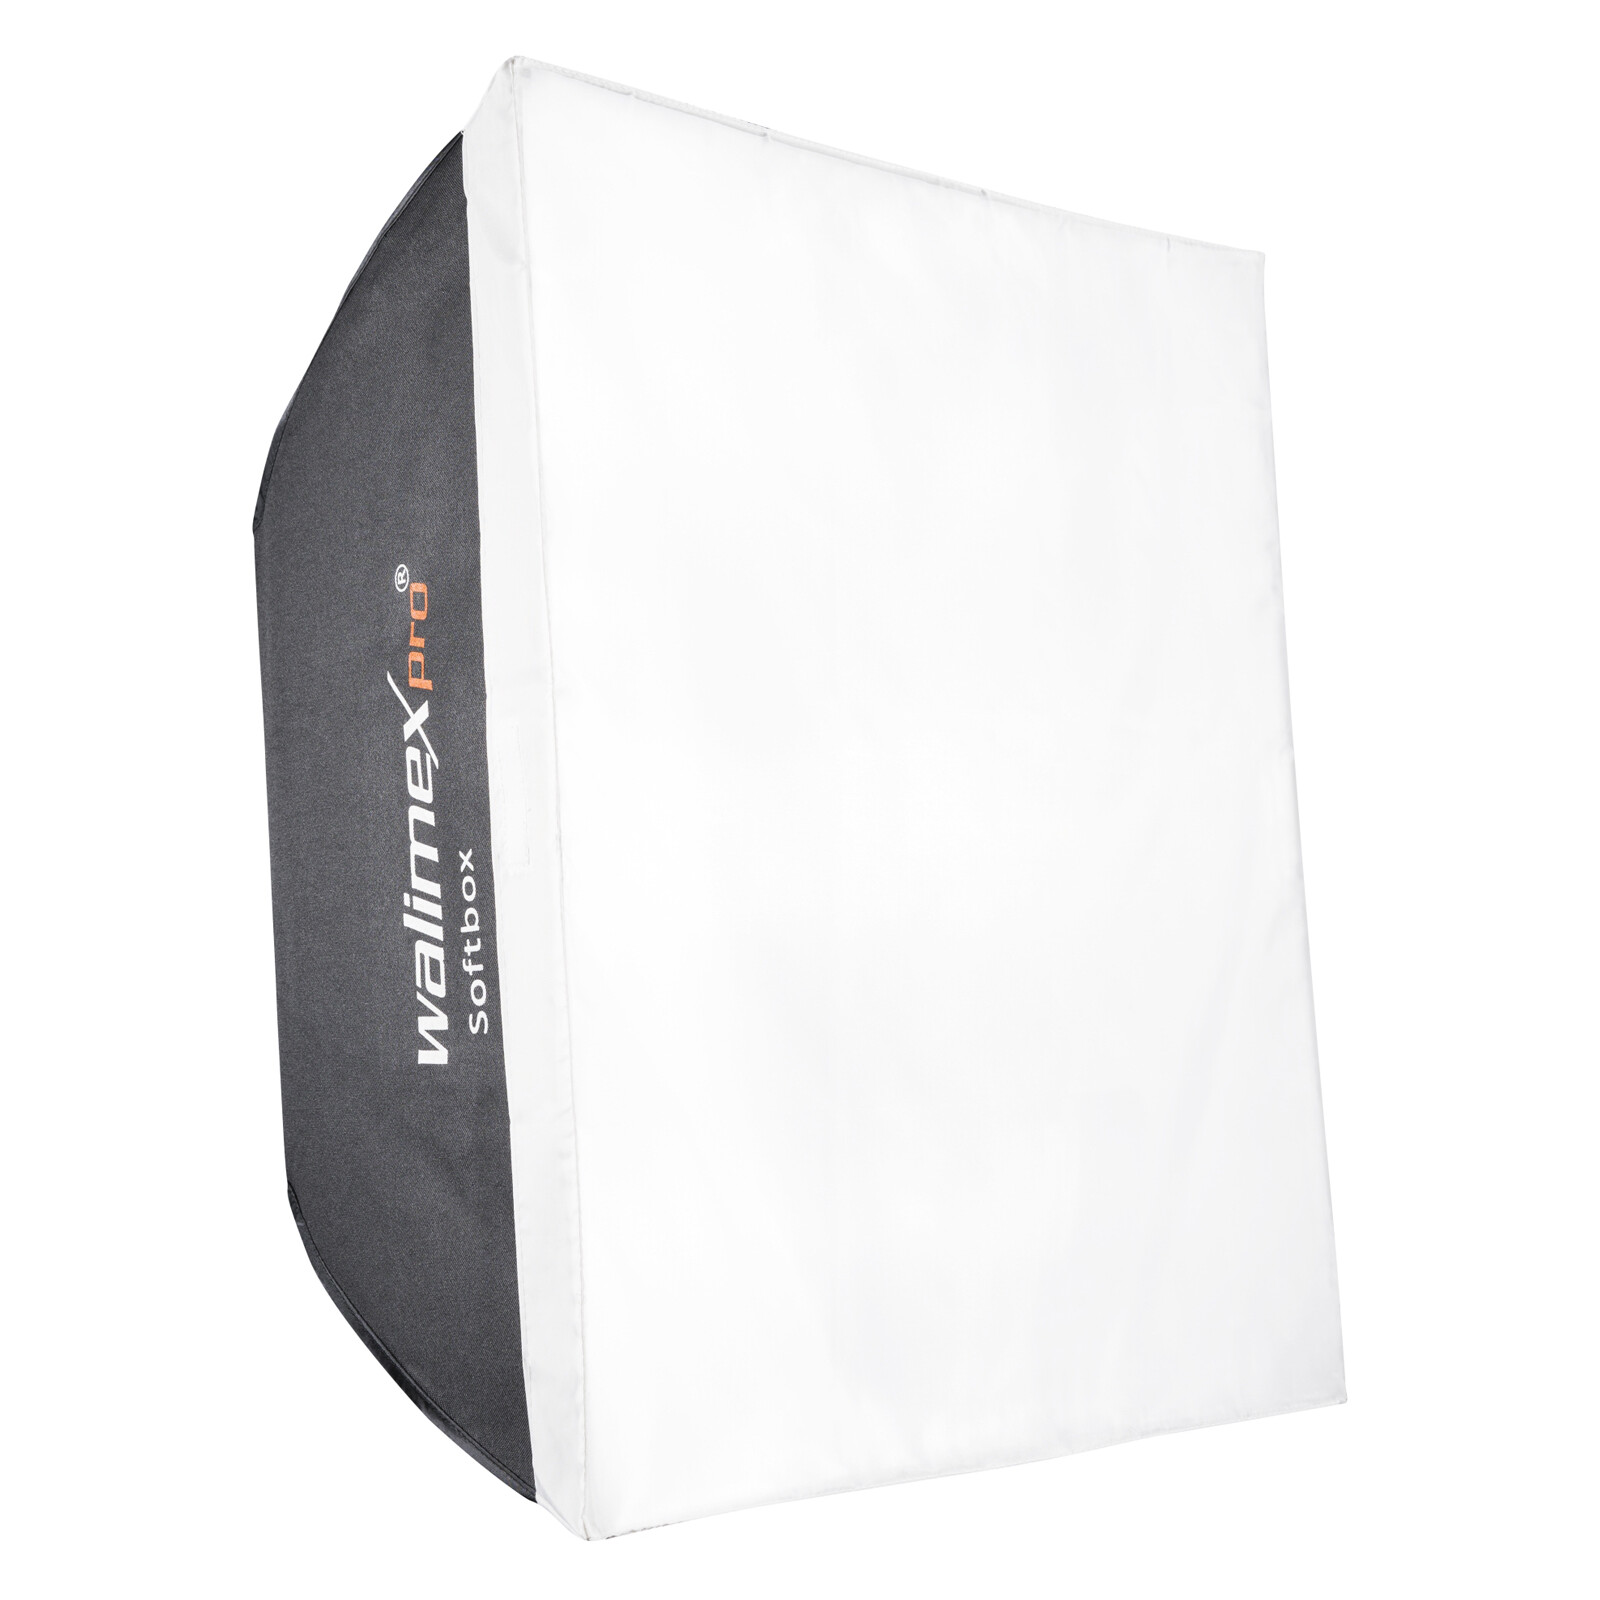 walimex pro Softbox 60x60cm für Electra small